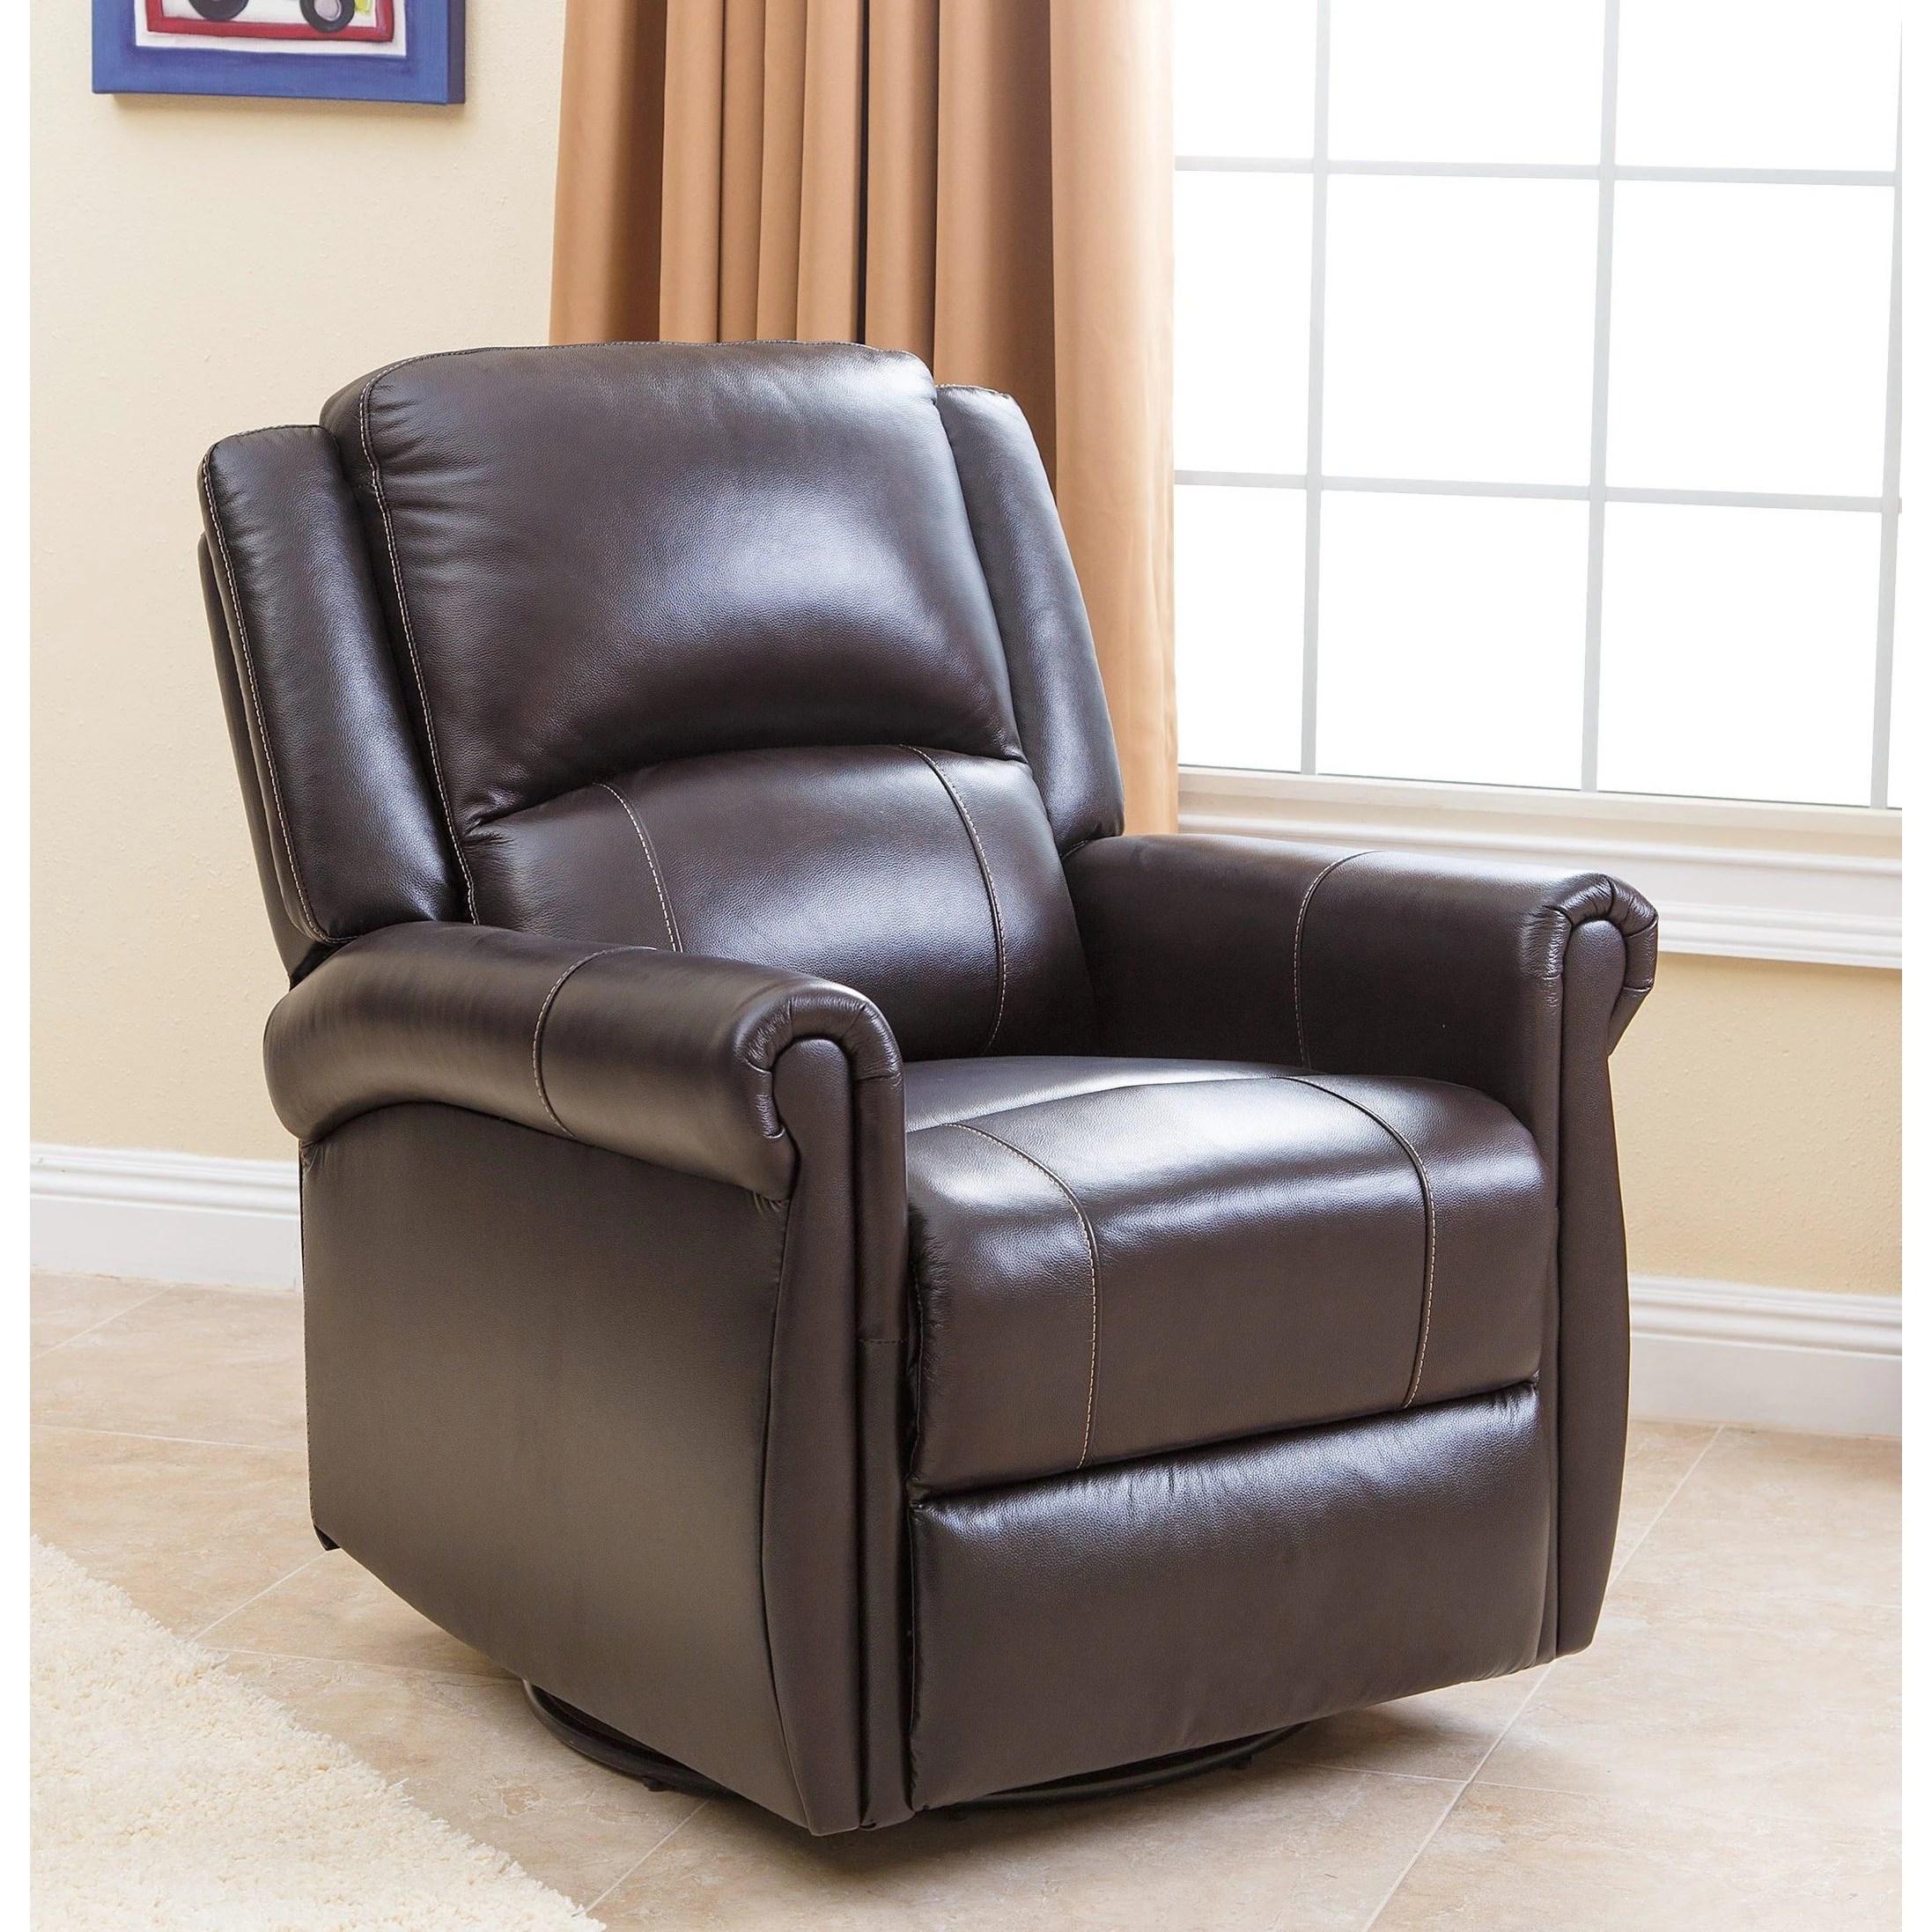 newport rocking chair covers for legs glider 196 series oak recliner nursery free